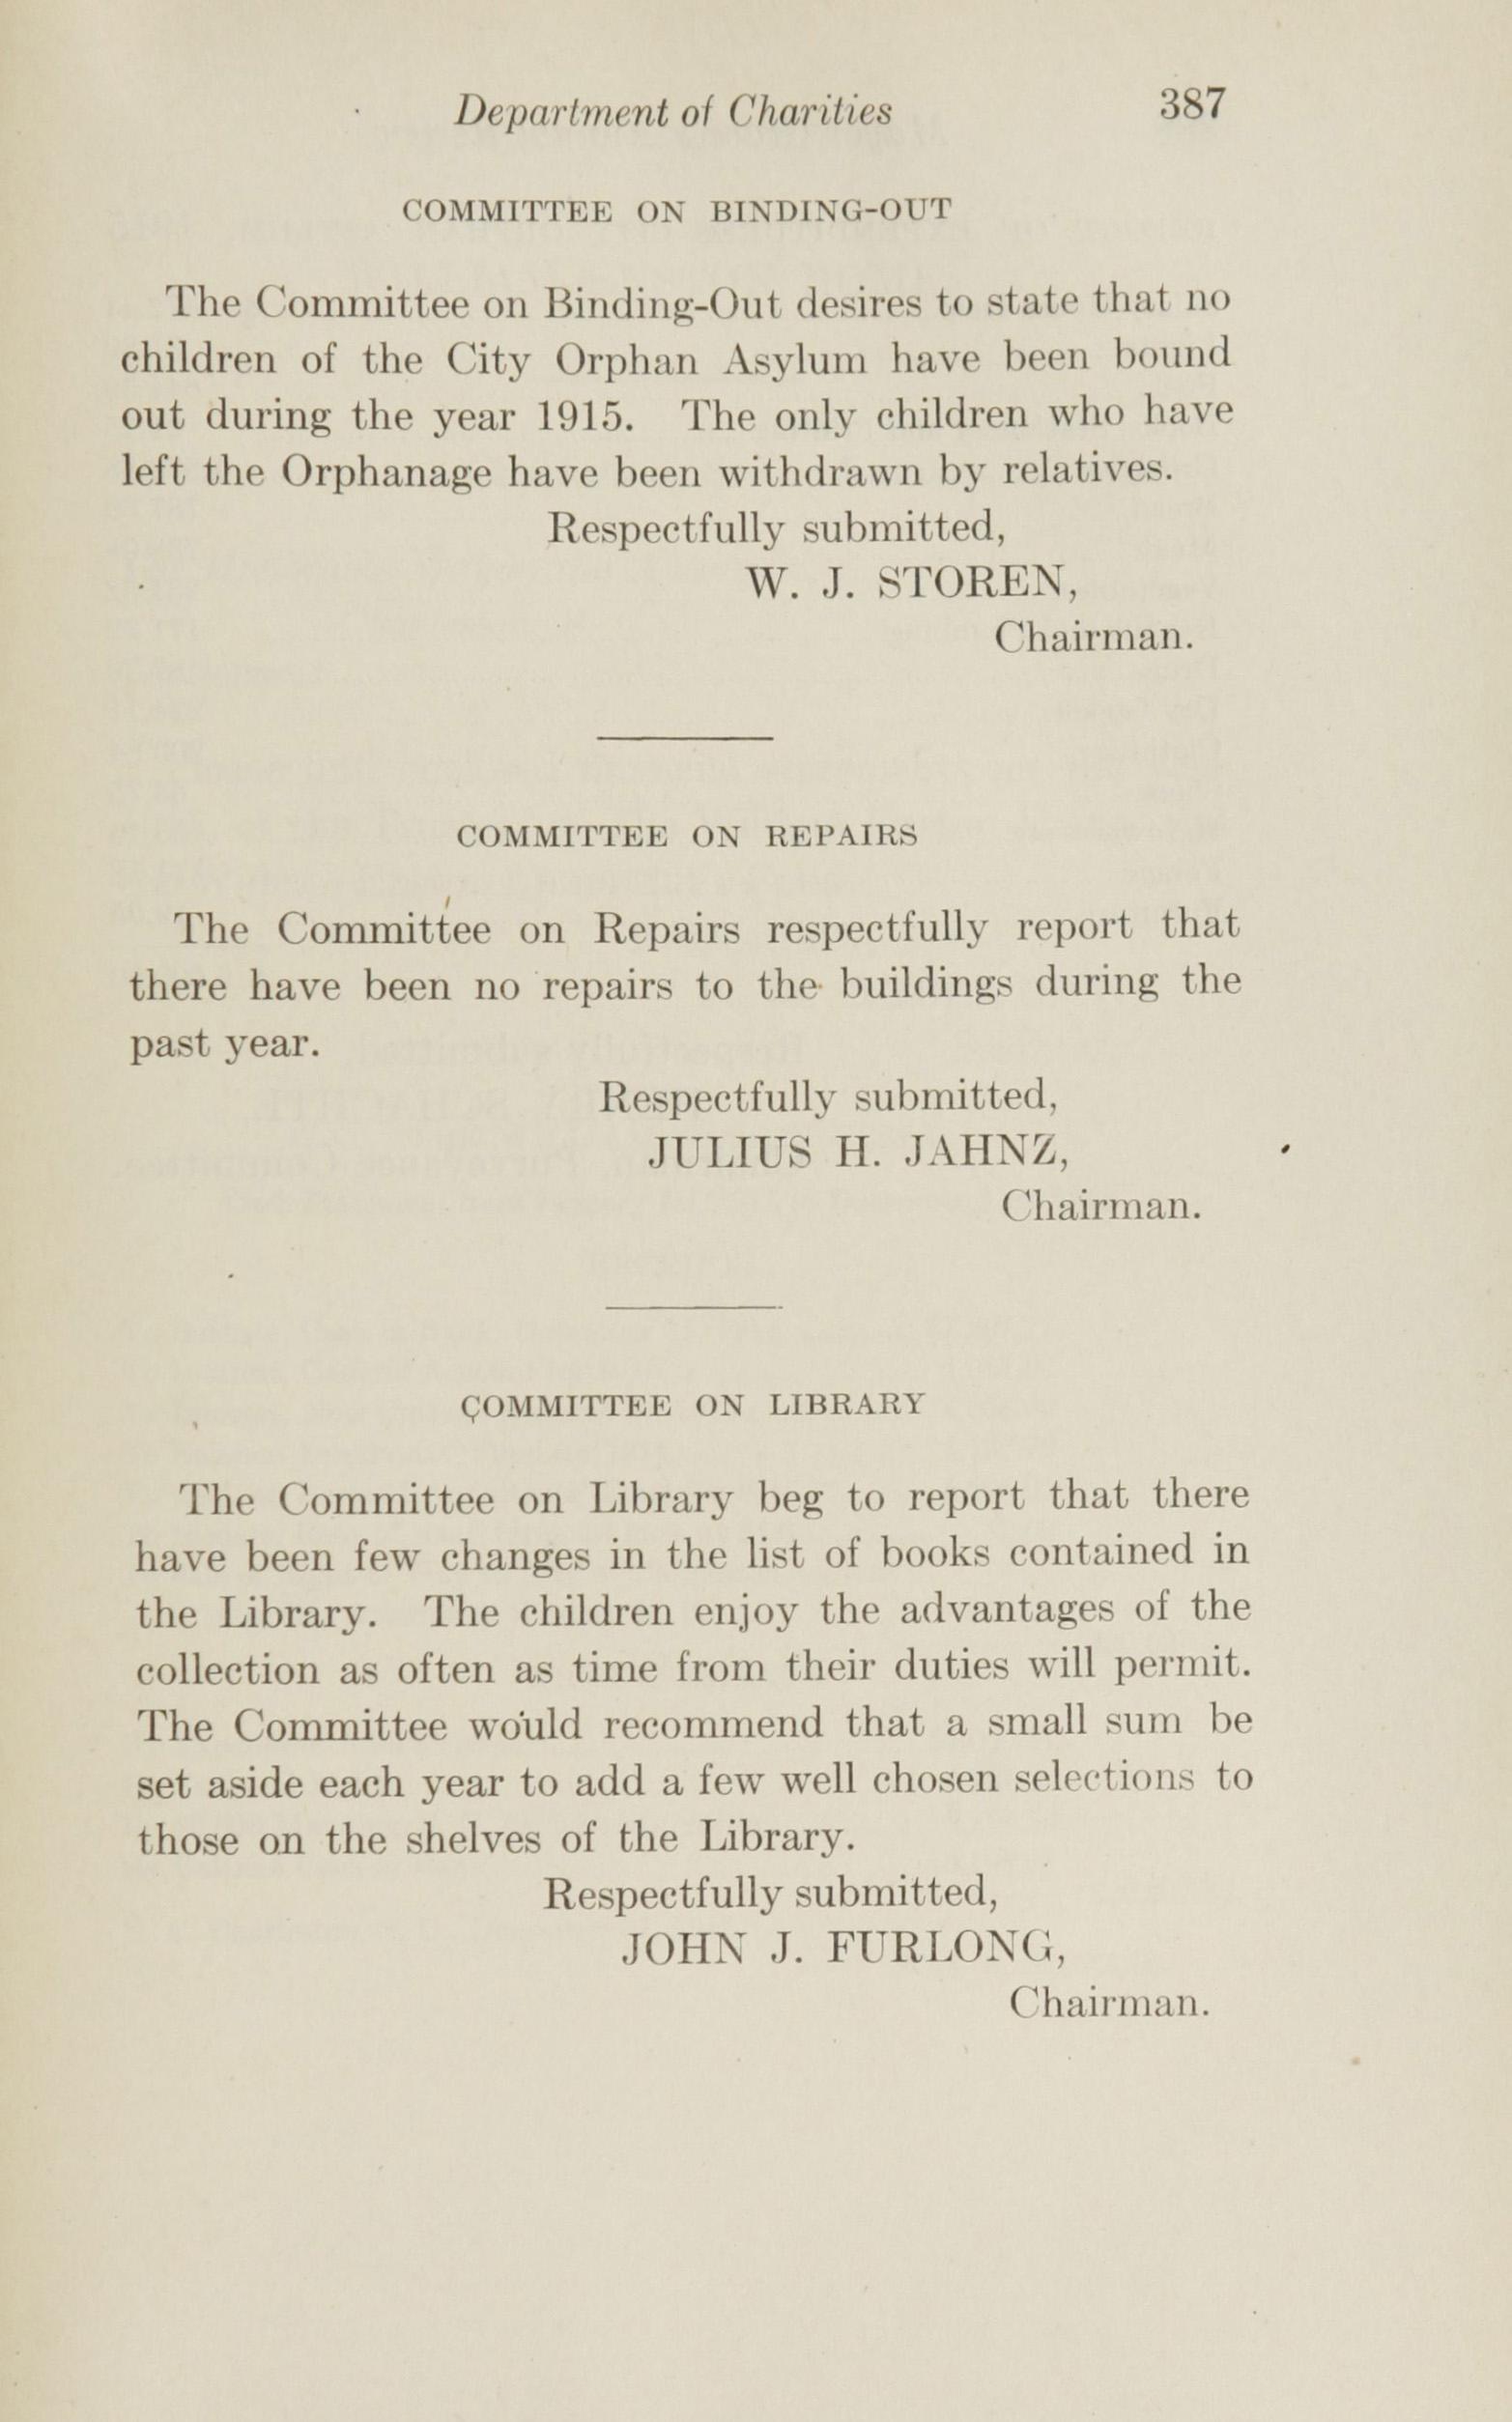 Charleston Yearbook, 1915, page 387